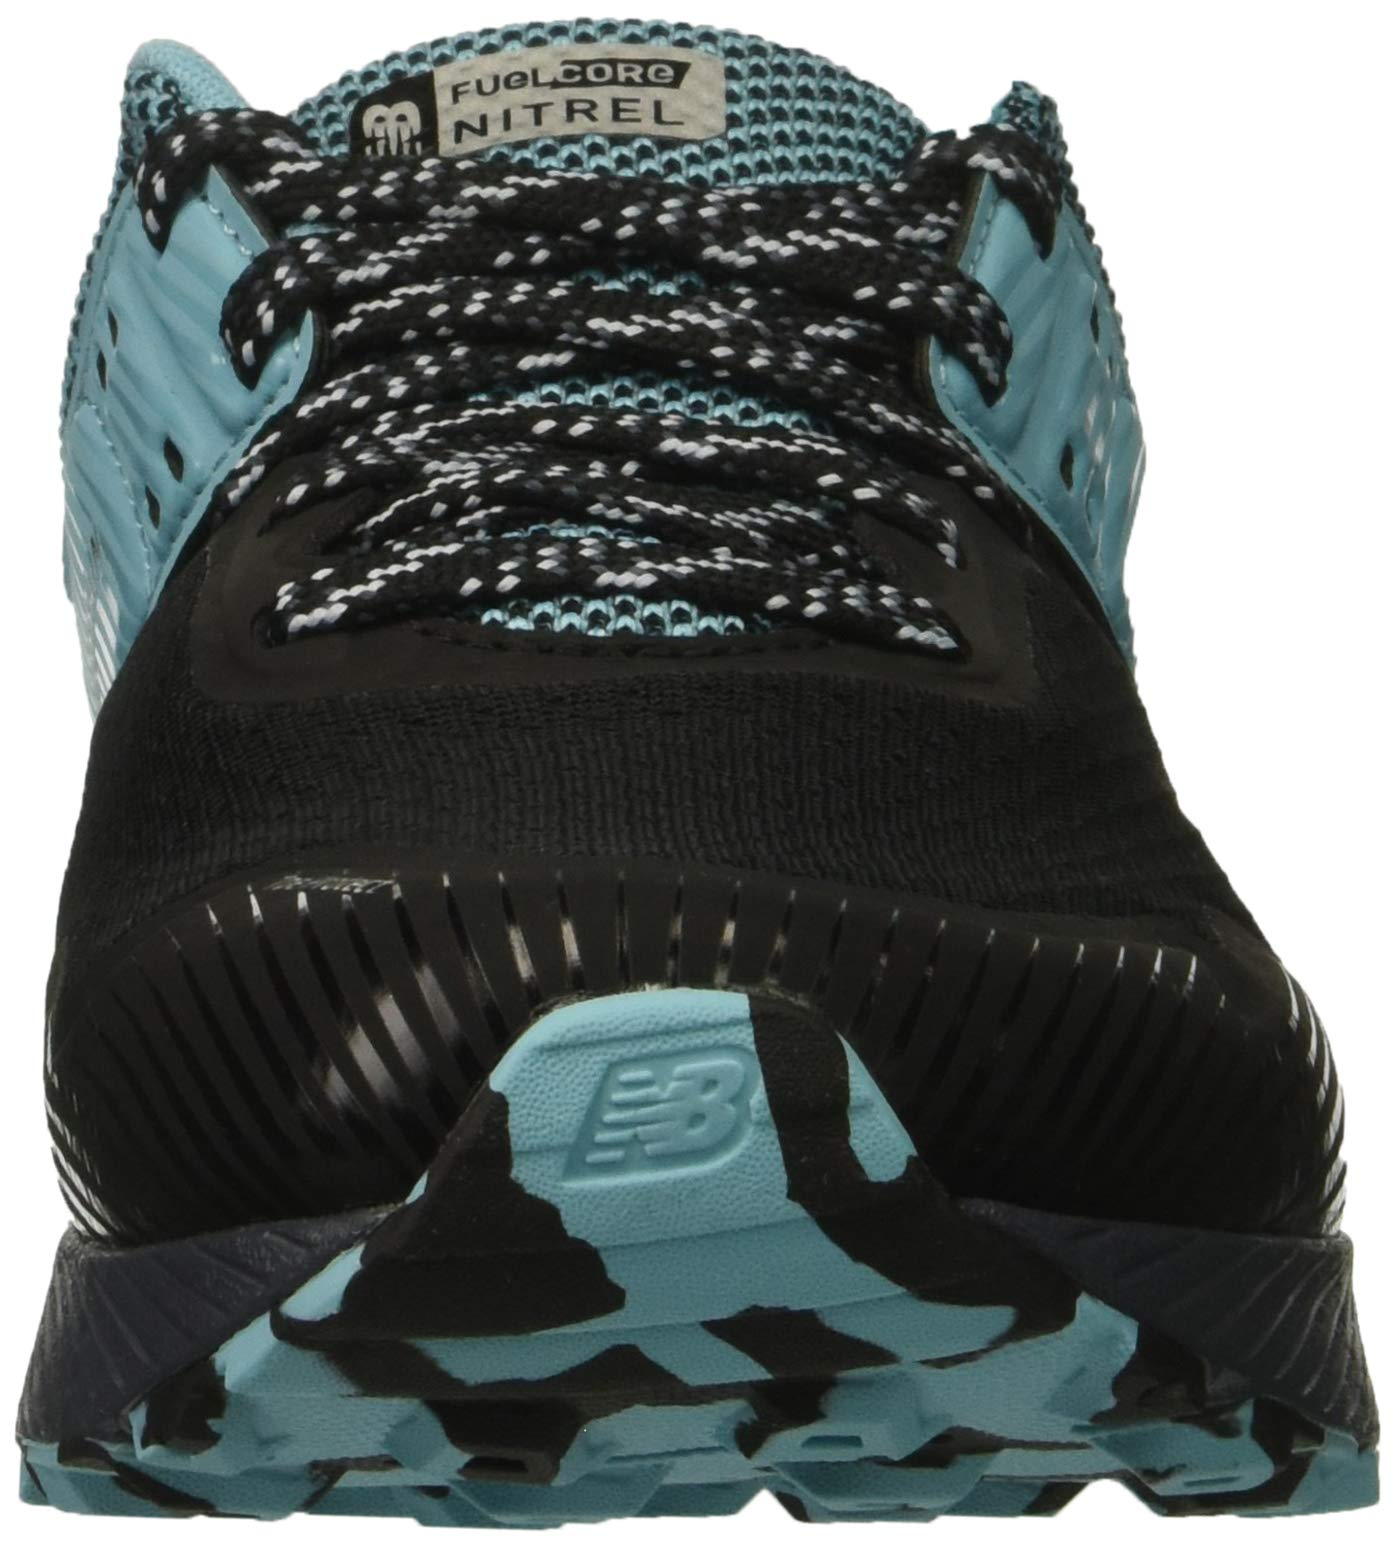 New Balance Women's Nitrel V2 FuelCore Trail Running Shoe, Black/Thunder/Enamel Blue, 6 B US by New Balance (Image #4)